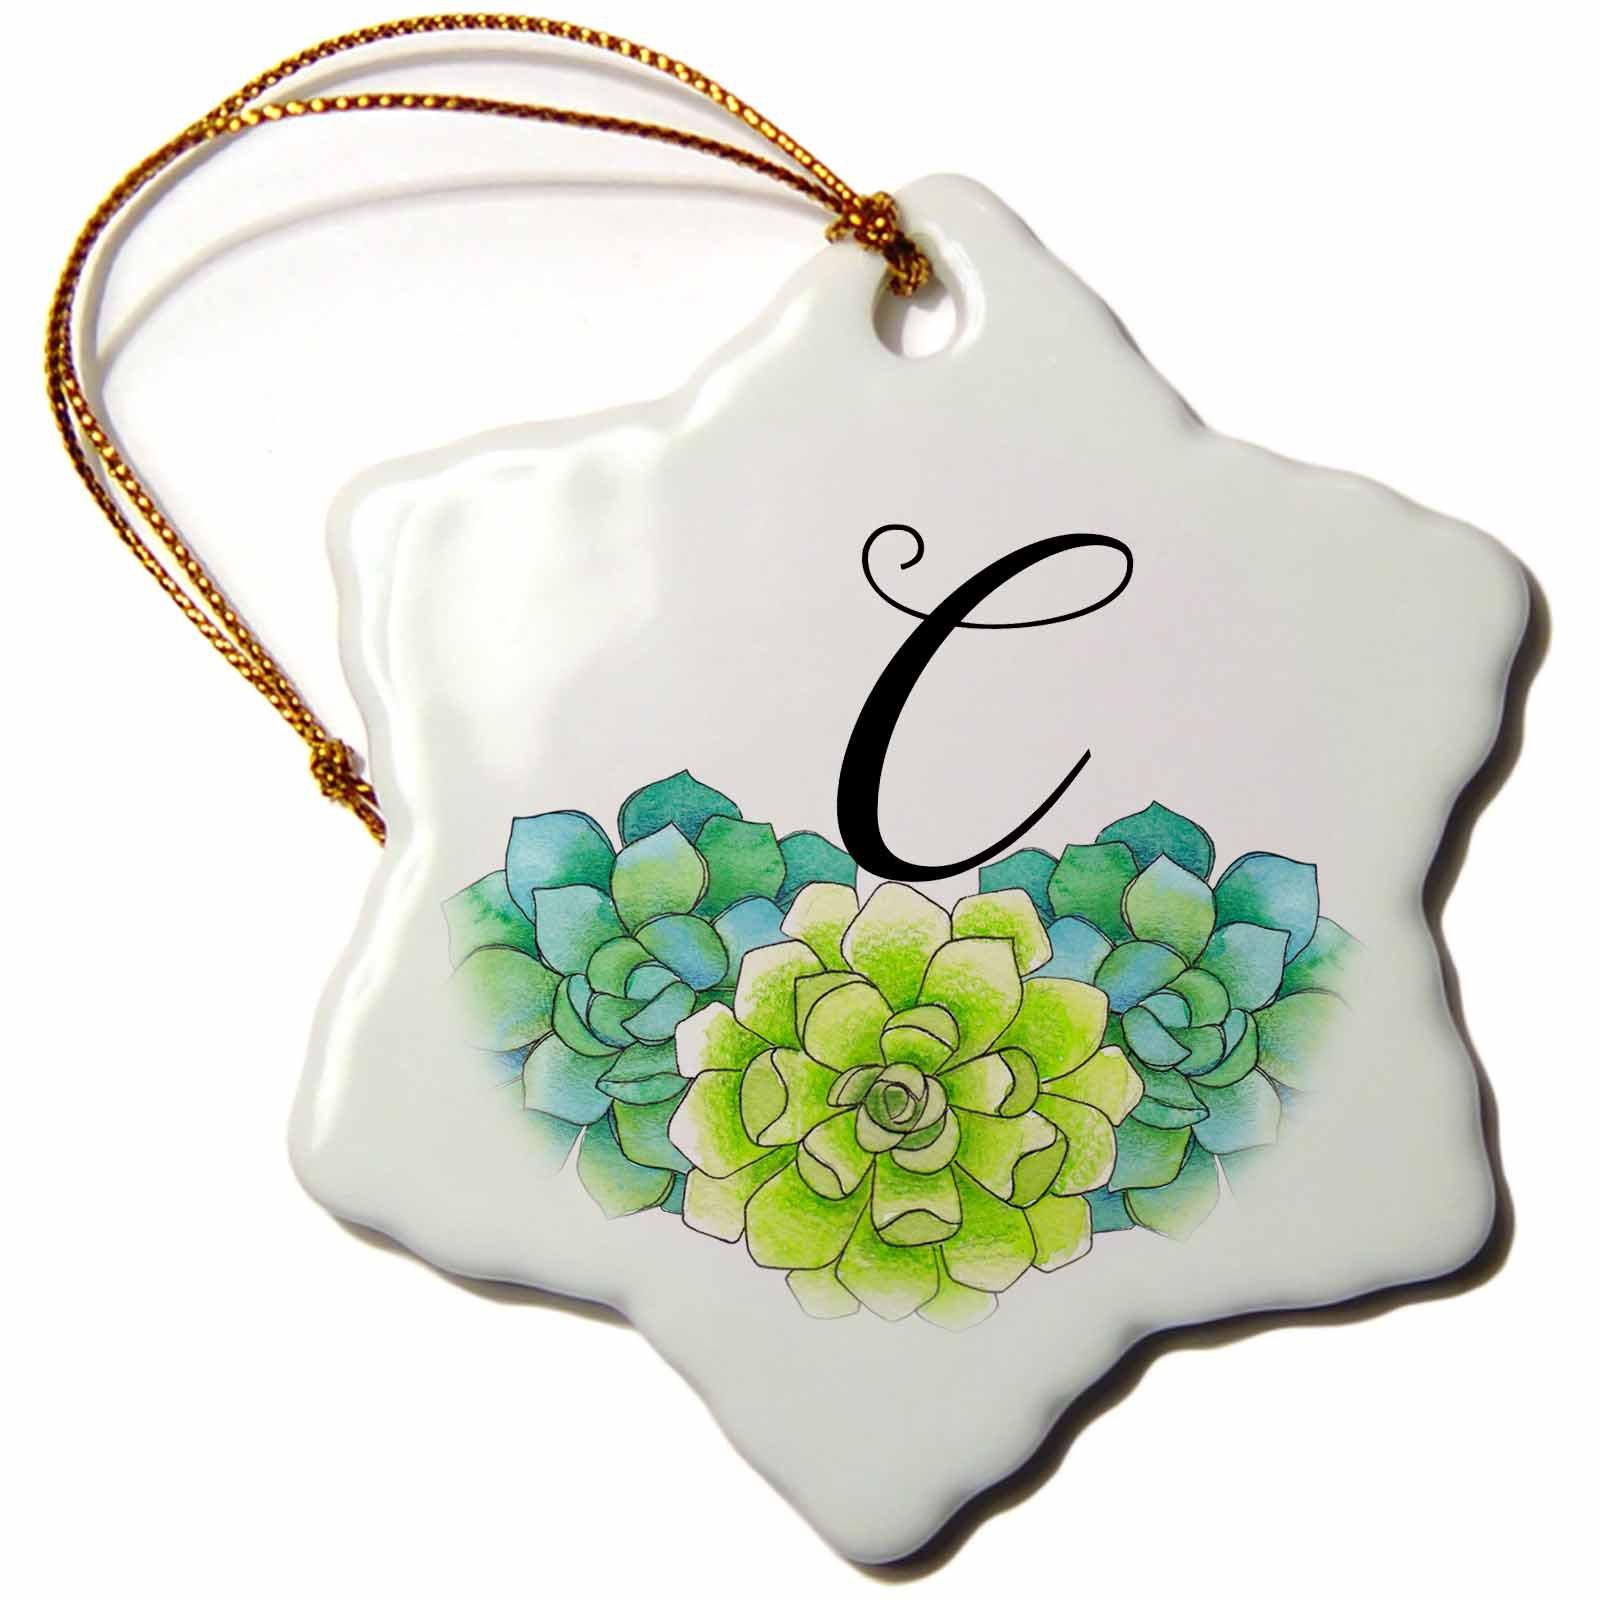 3dRose Anne Marie Baugh - Monograms - Pretty Watercolor Green Succulent Flowers Monogram C - 3 inch Snowflake Porcelain Ornament (orn_267752_1)